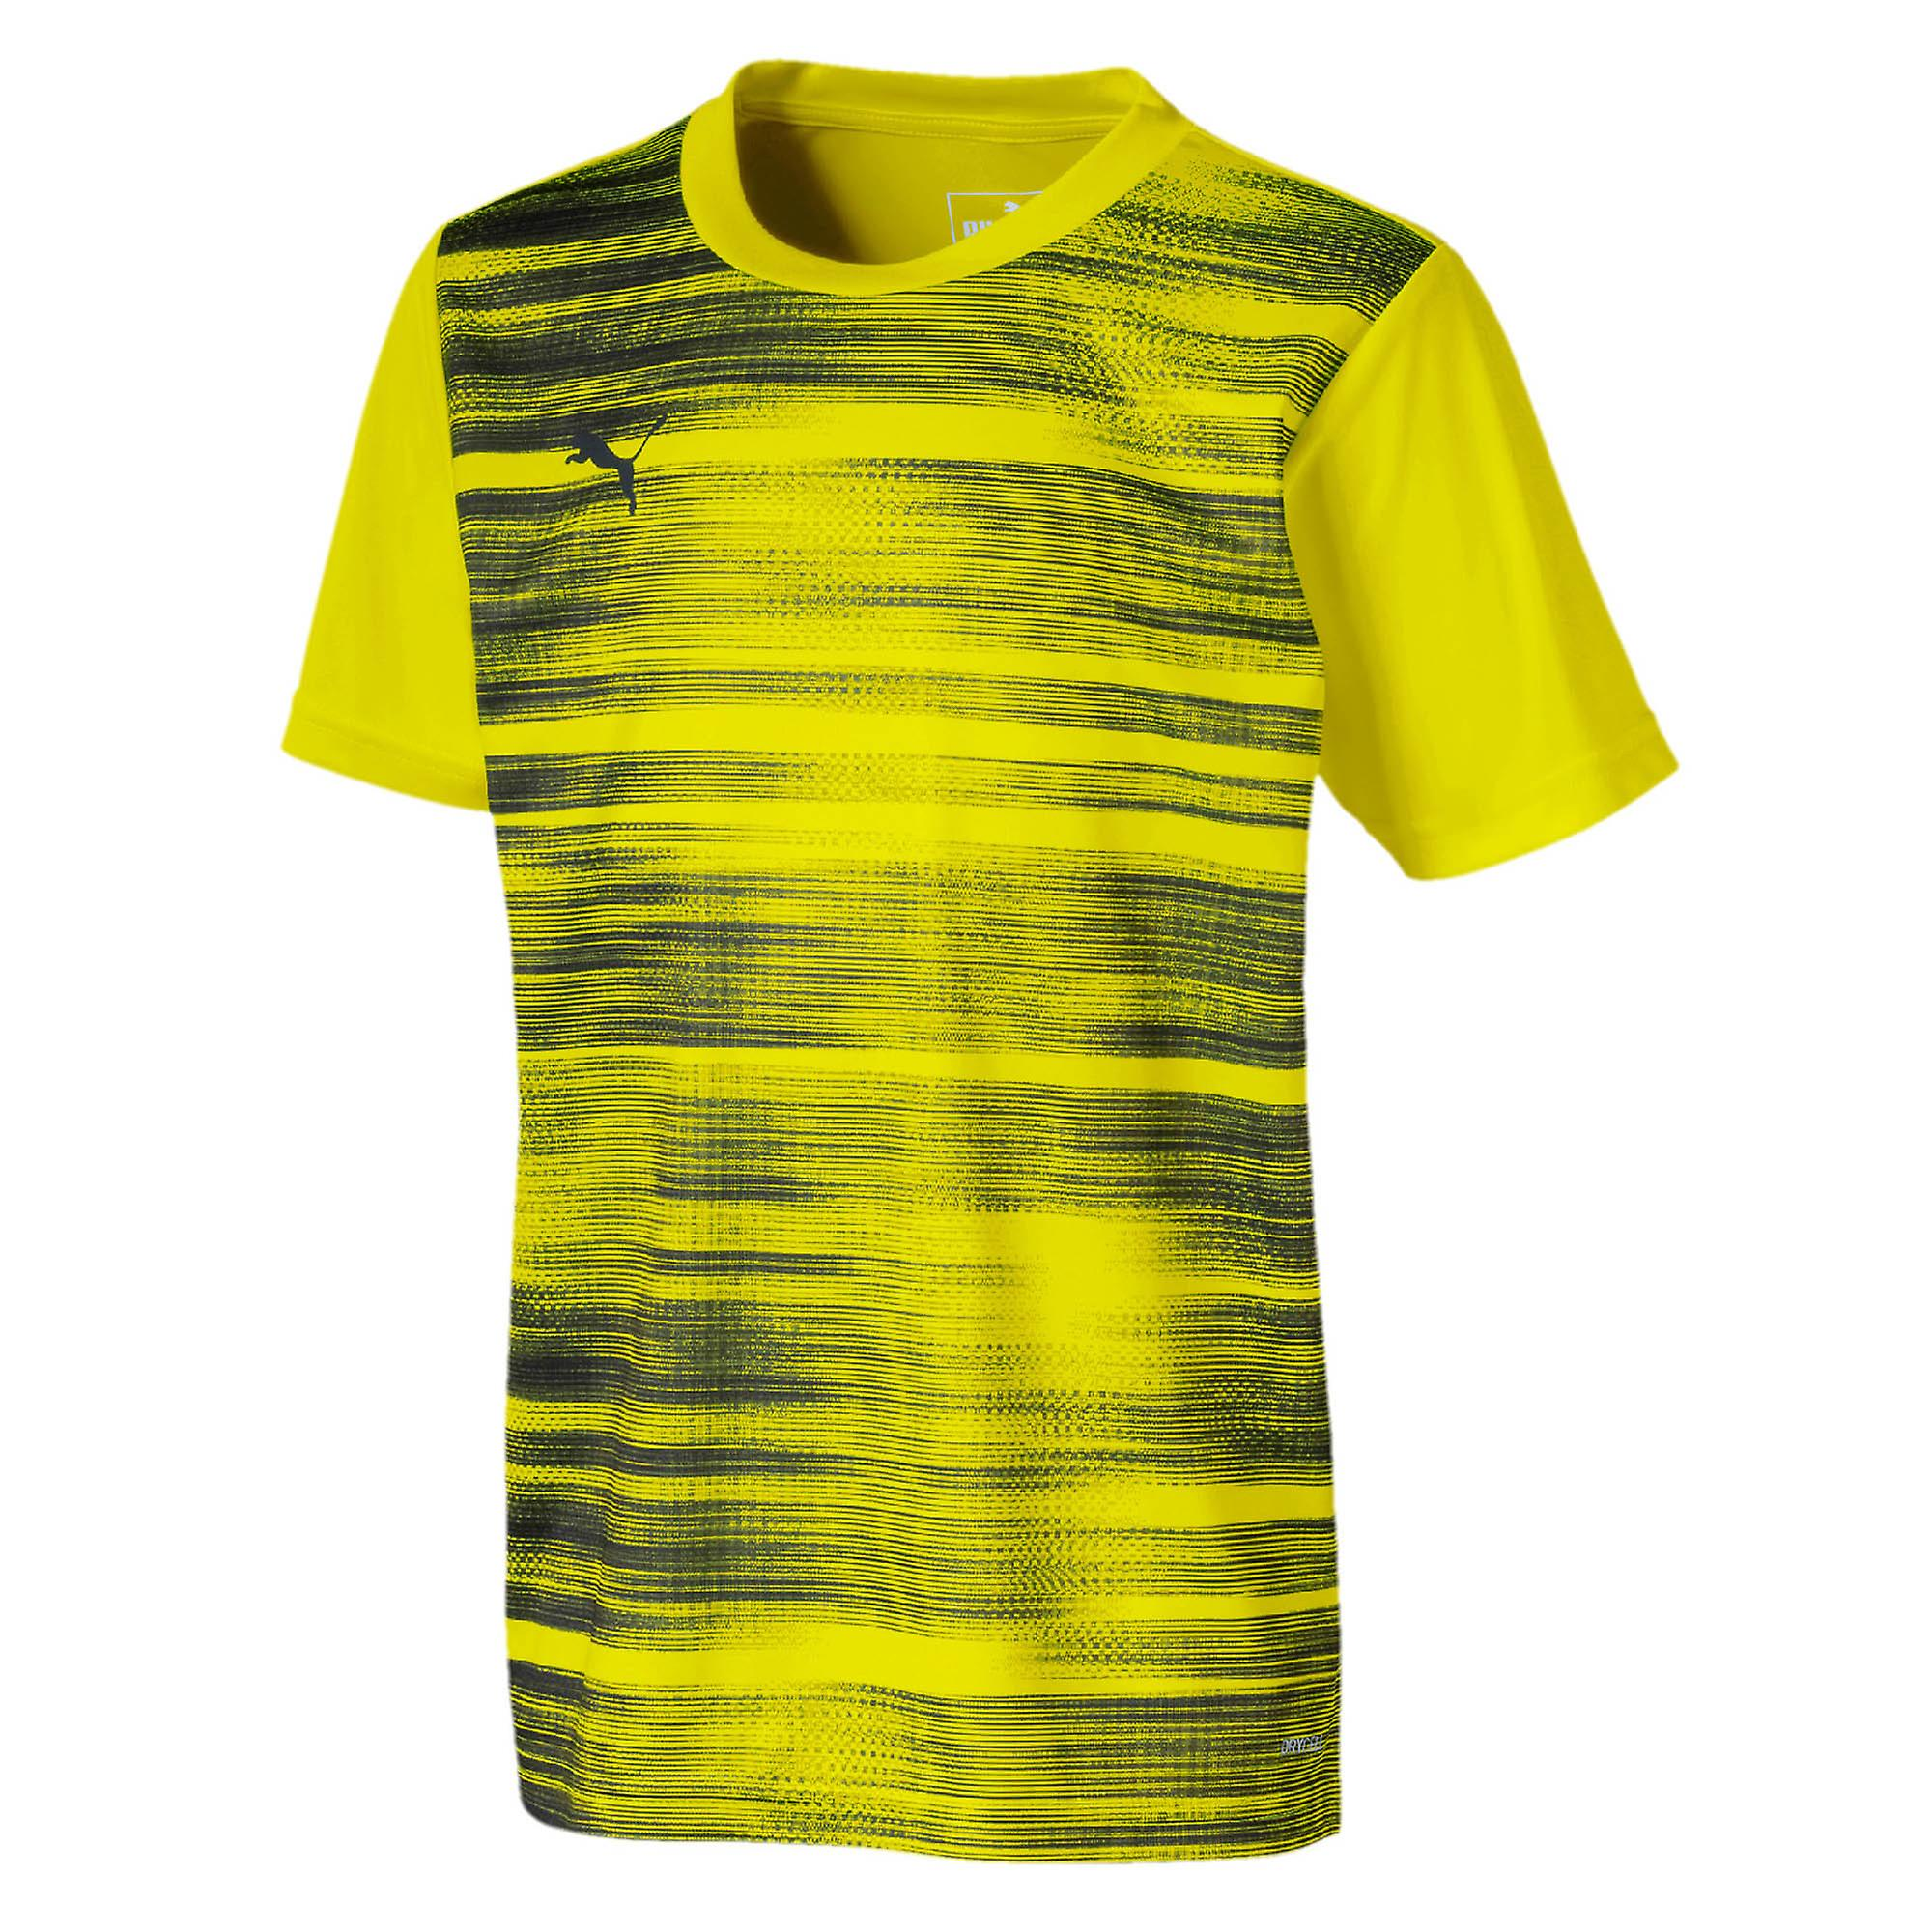 Puma FtblNXT Graphic Kids Fitness Training Sports T-Shirt Shirt Tee Yellow/Grey